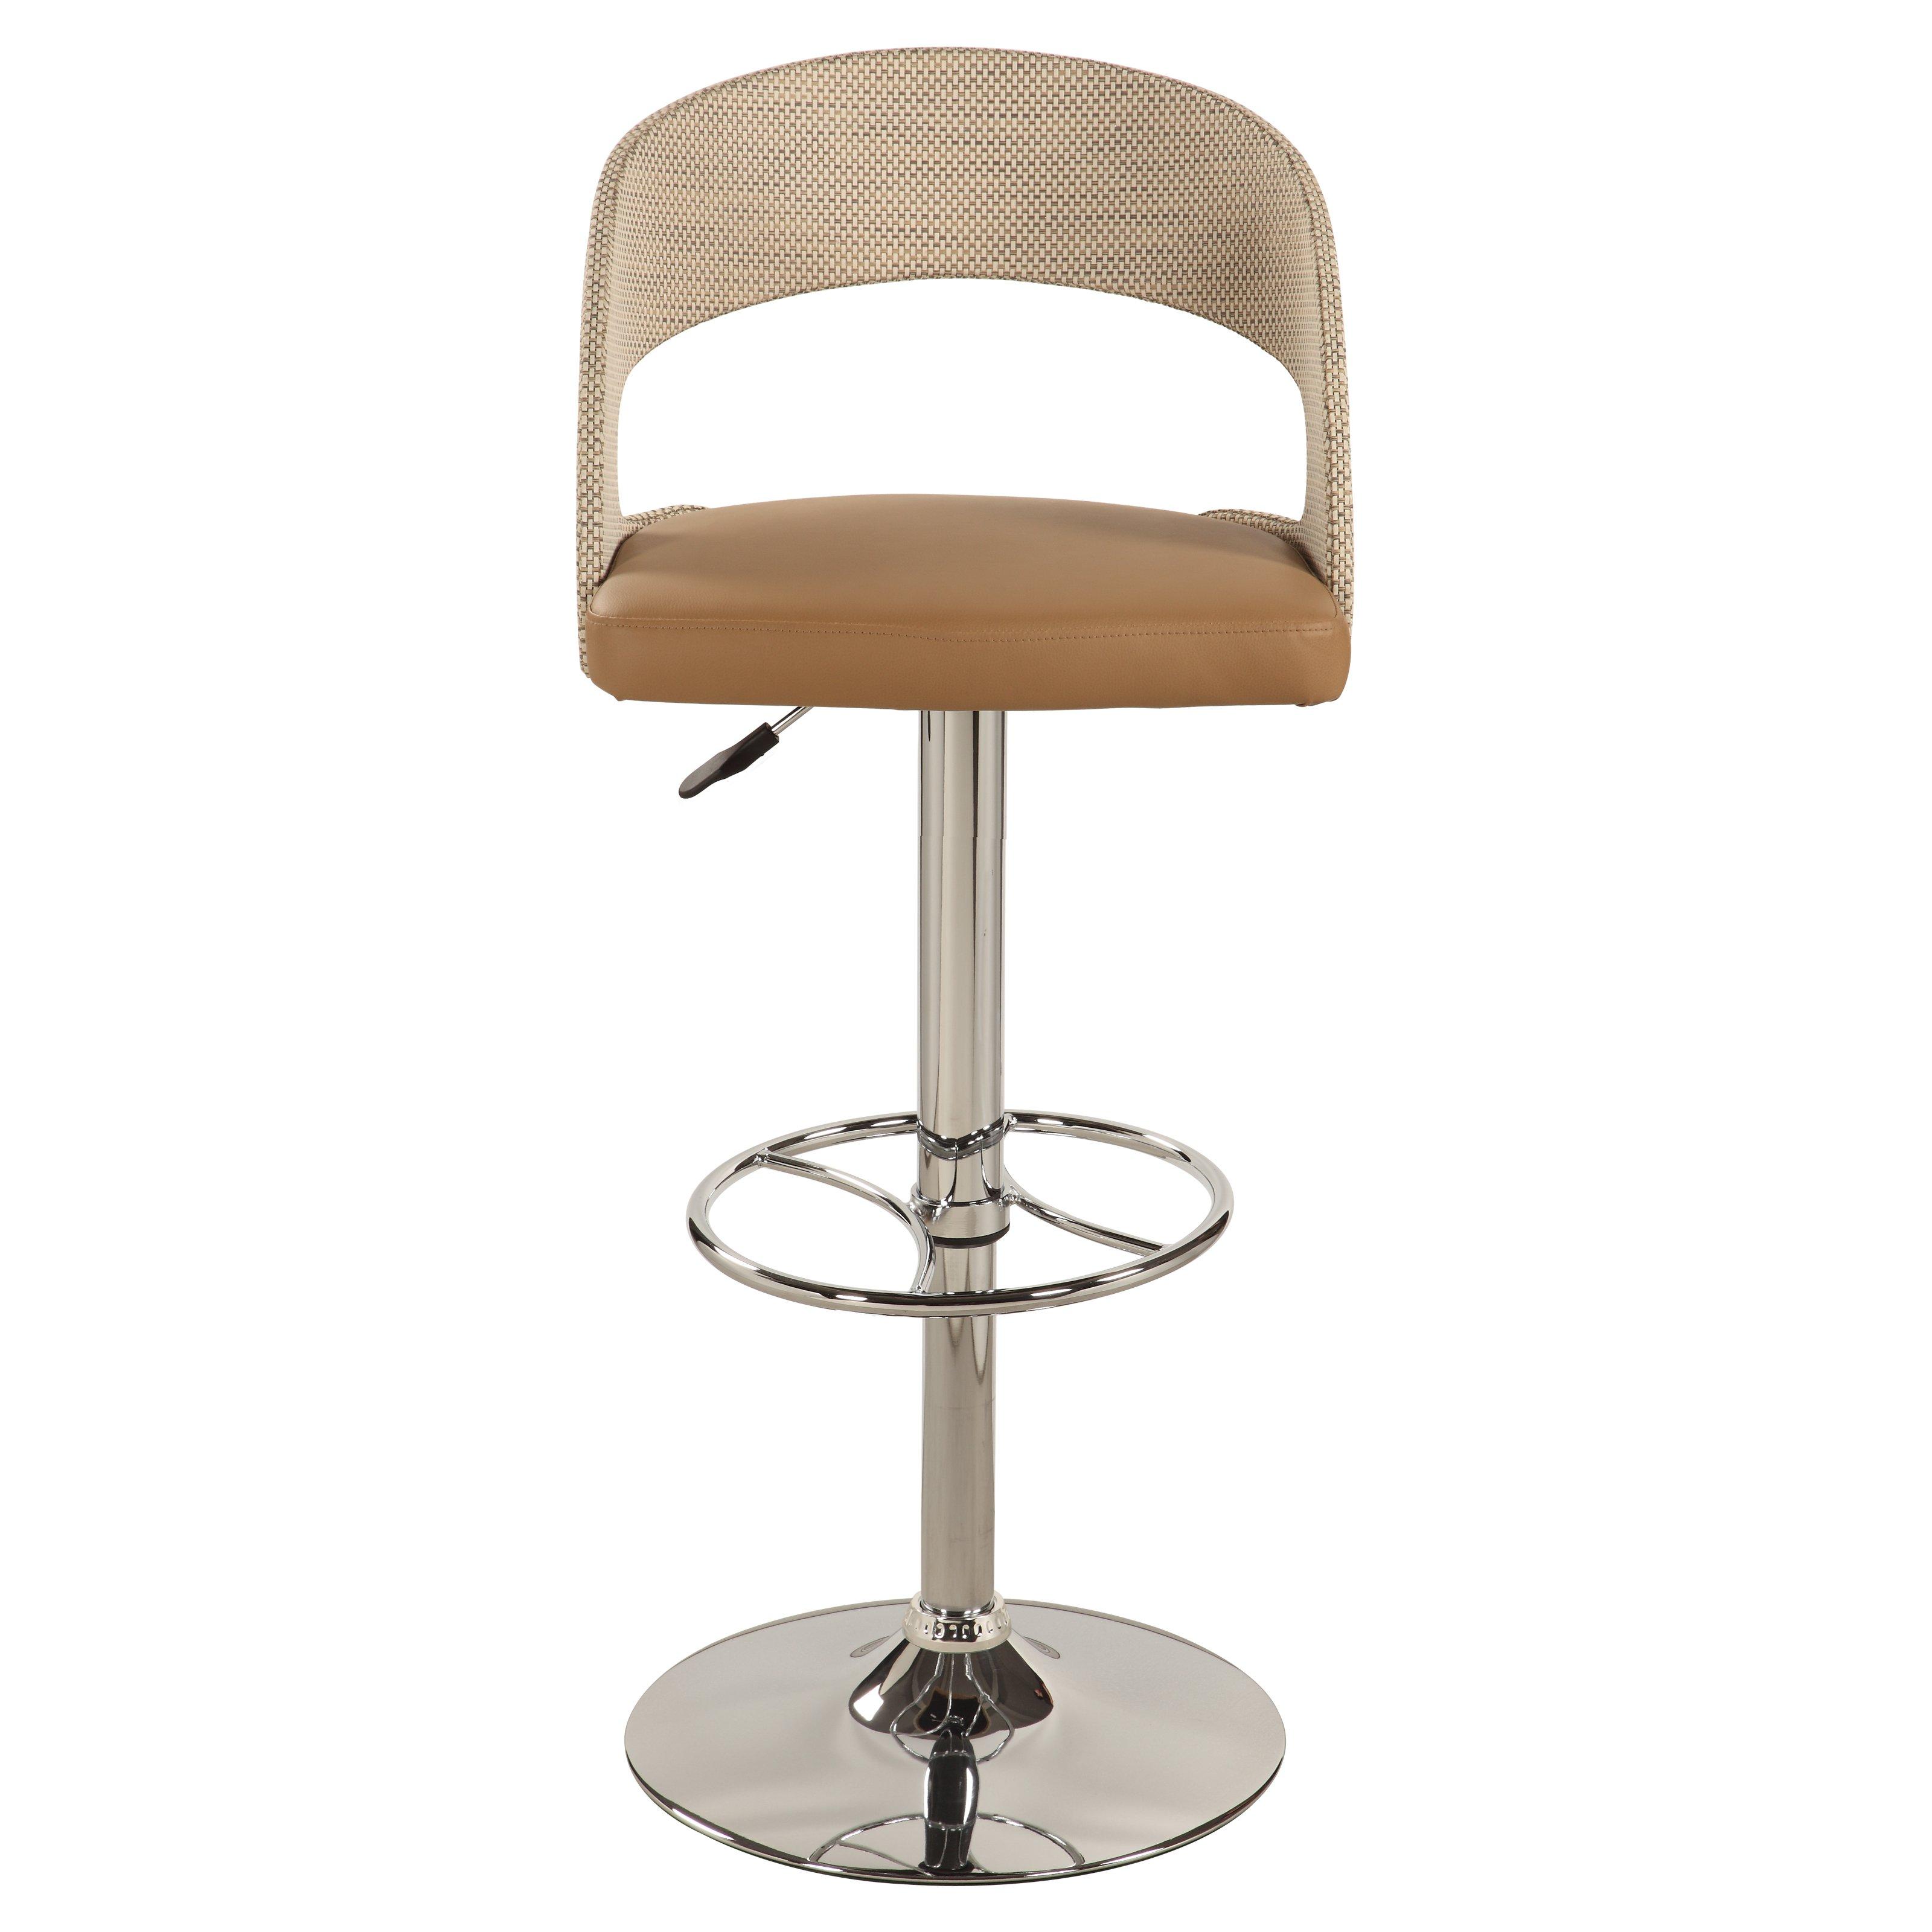 adjustable swivel bar stool with back chintaly aerona adjustable swivel bar stool with round back |  Hay needle LVHAZBB